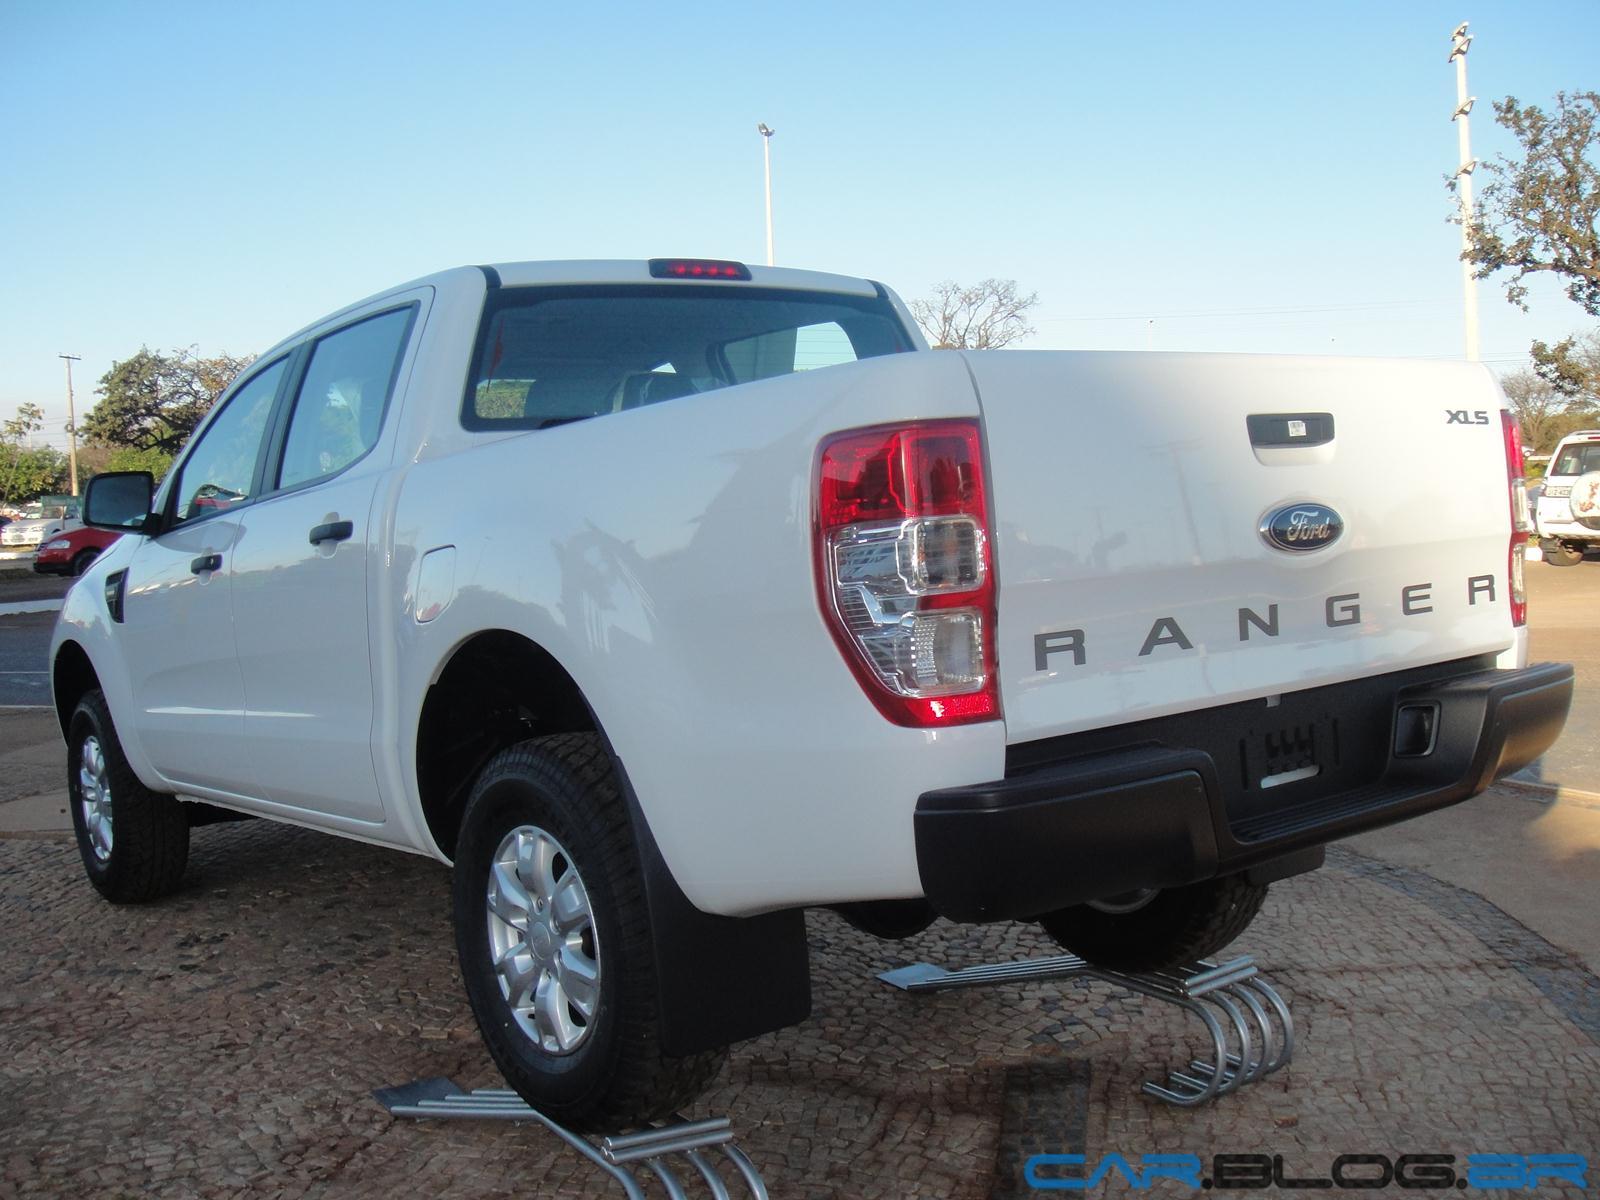 Nova Ford Ranger XLS Cabine Dupla 2.5 Flex 2013: fotos ...